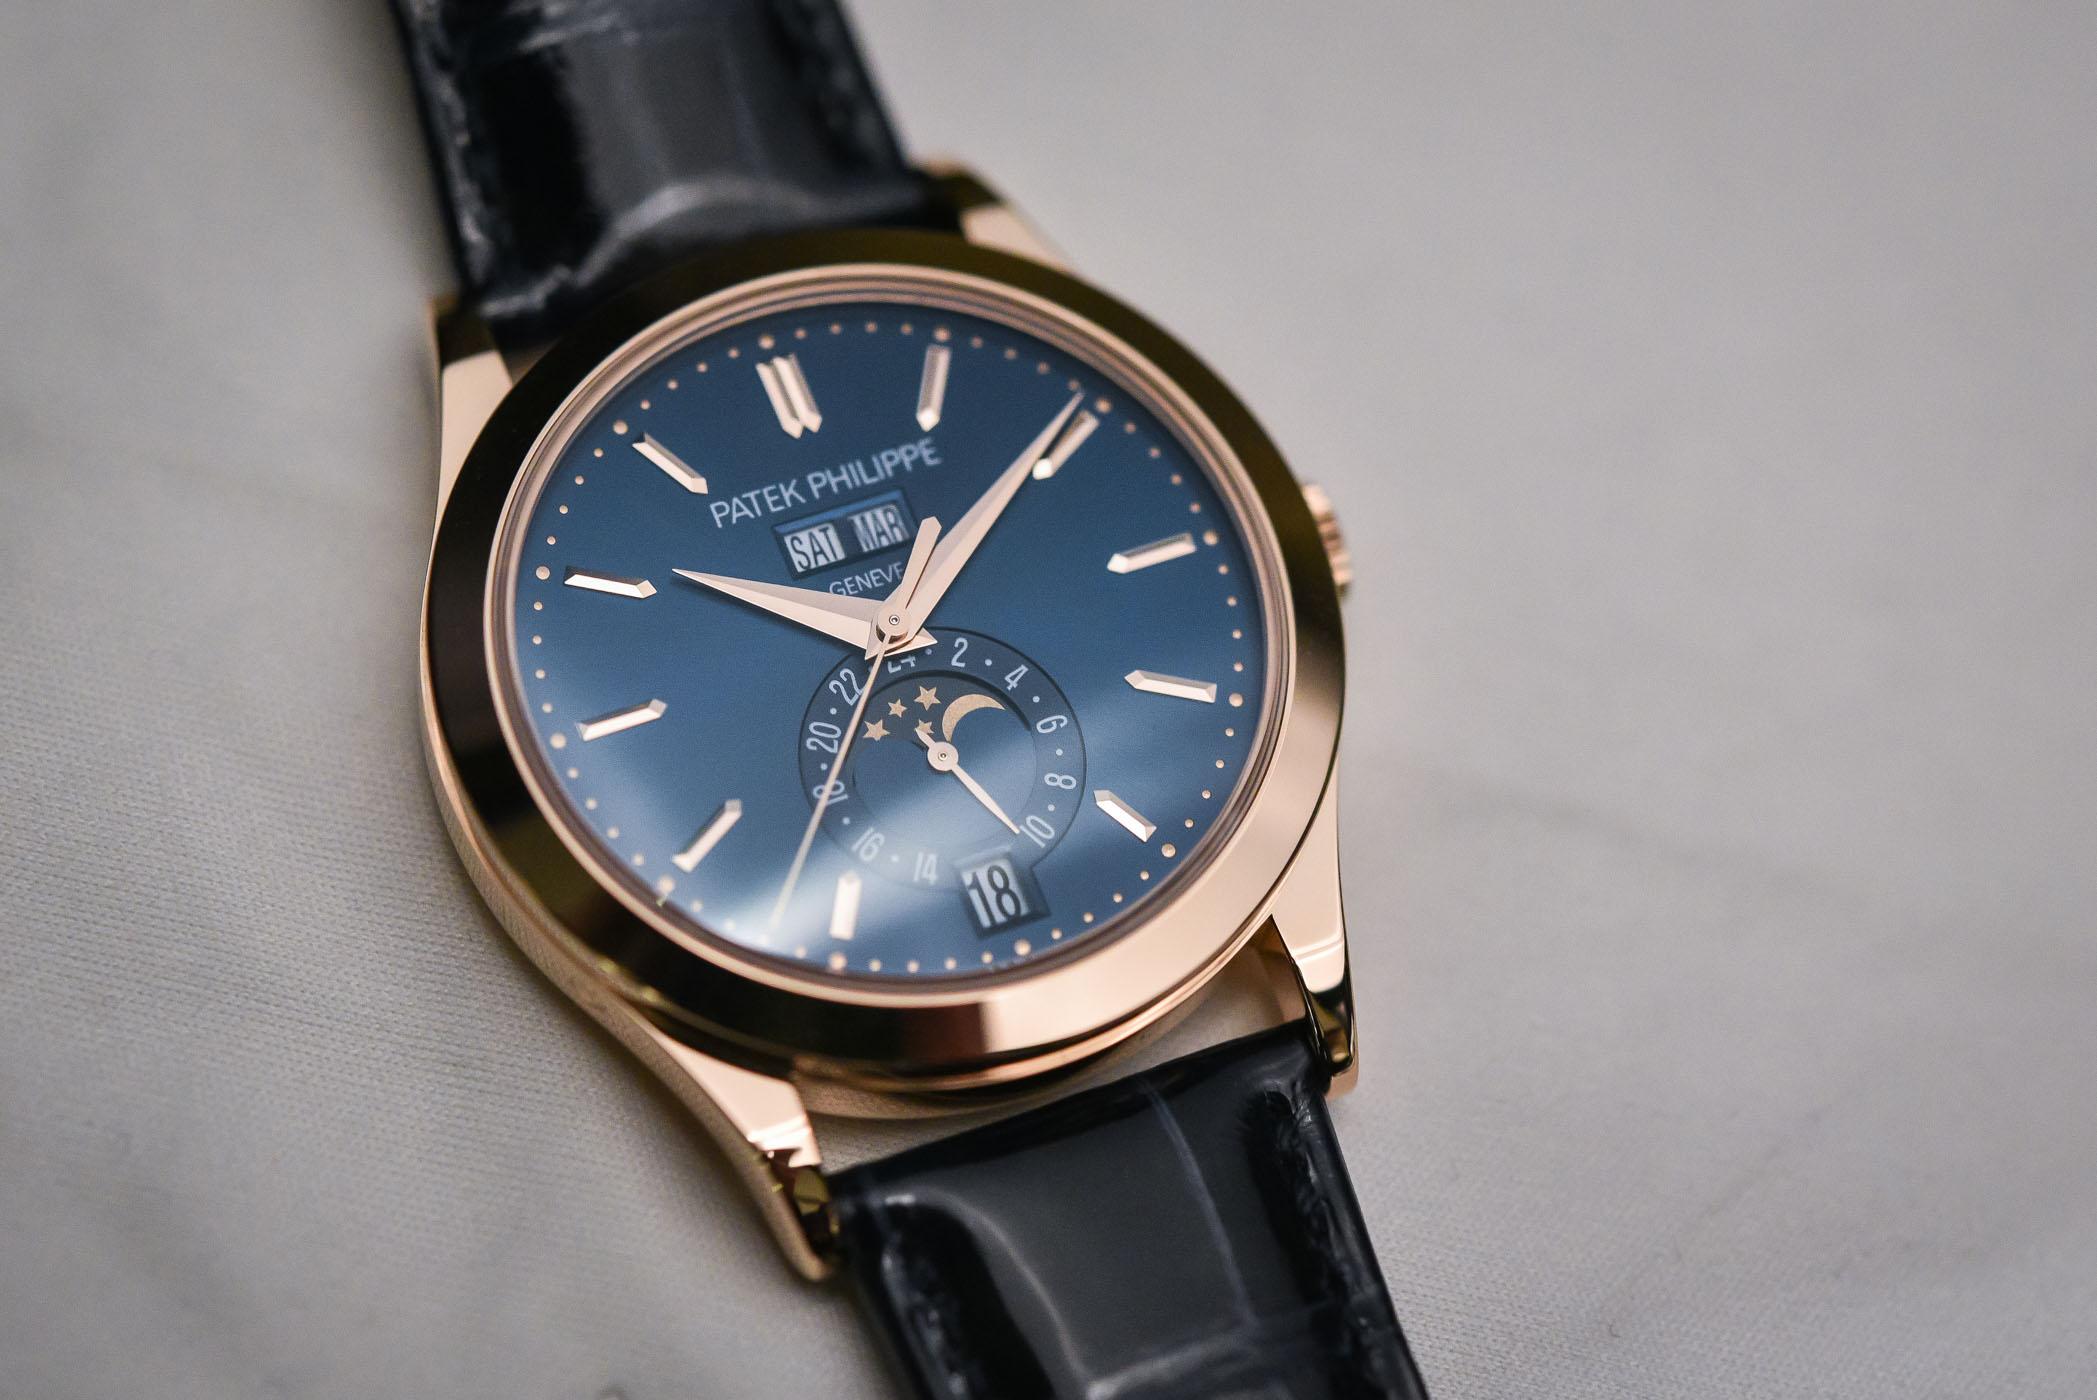 Hands-On - Patek Philippe 5396R Annual Calendar Blue Dial (Specs & Price)